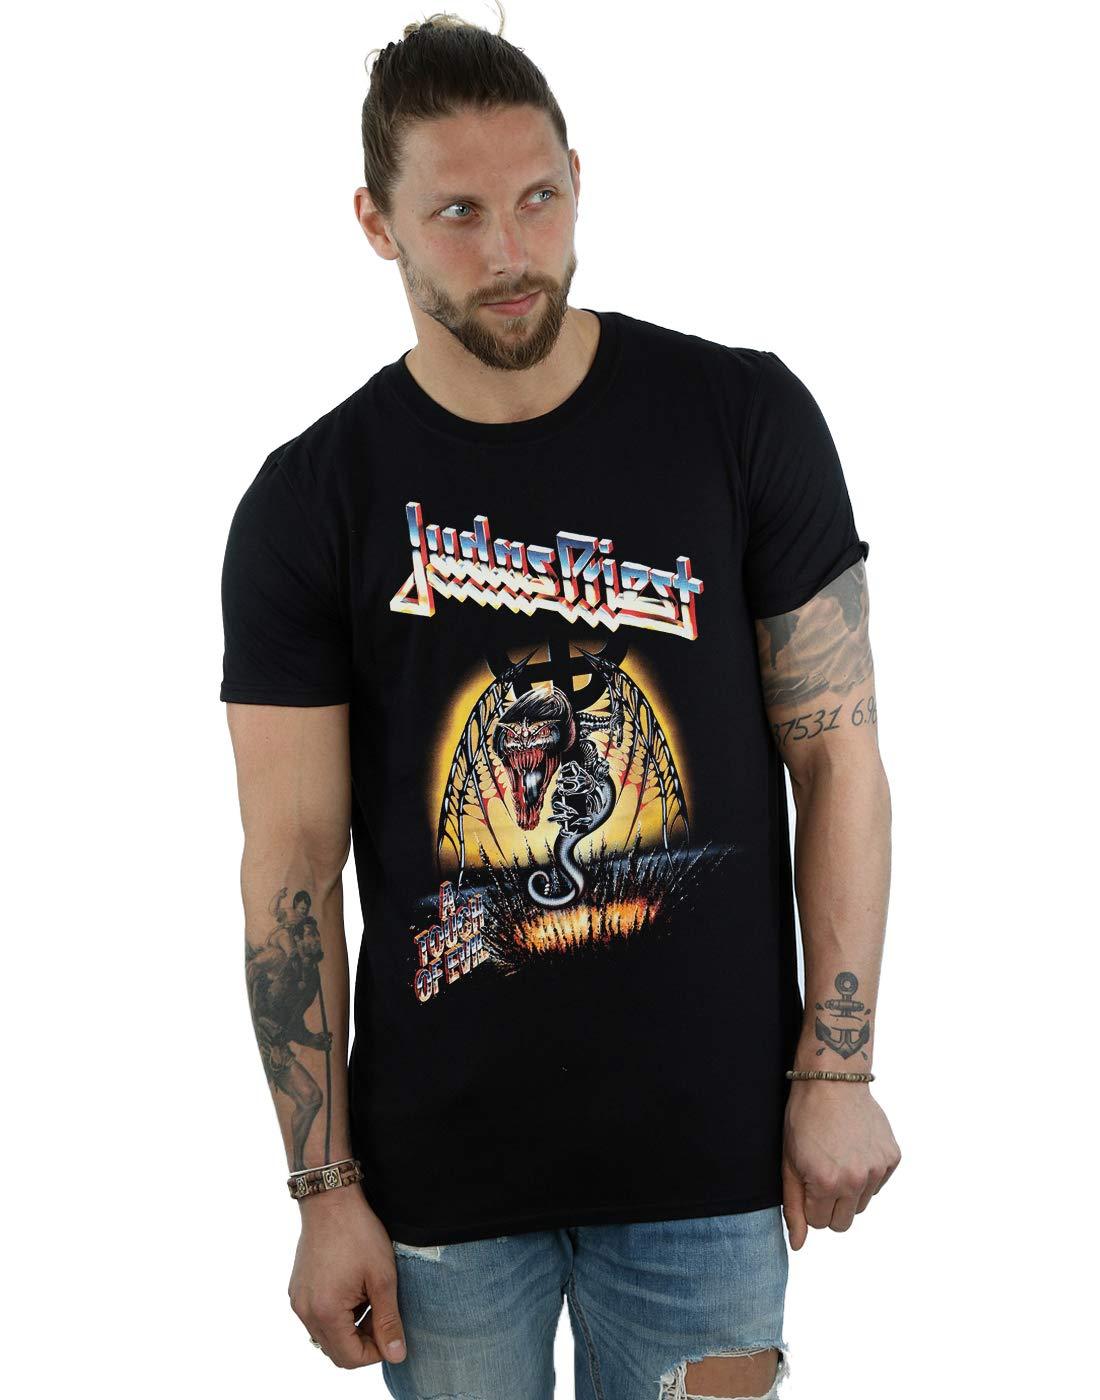 Judas Priest S Touch Of Evil Tshirt